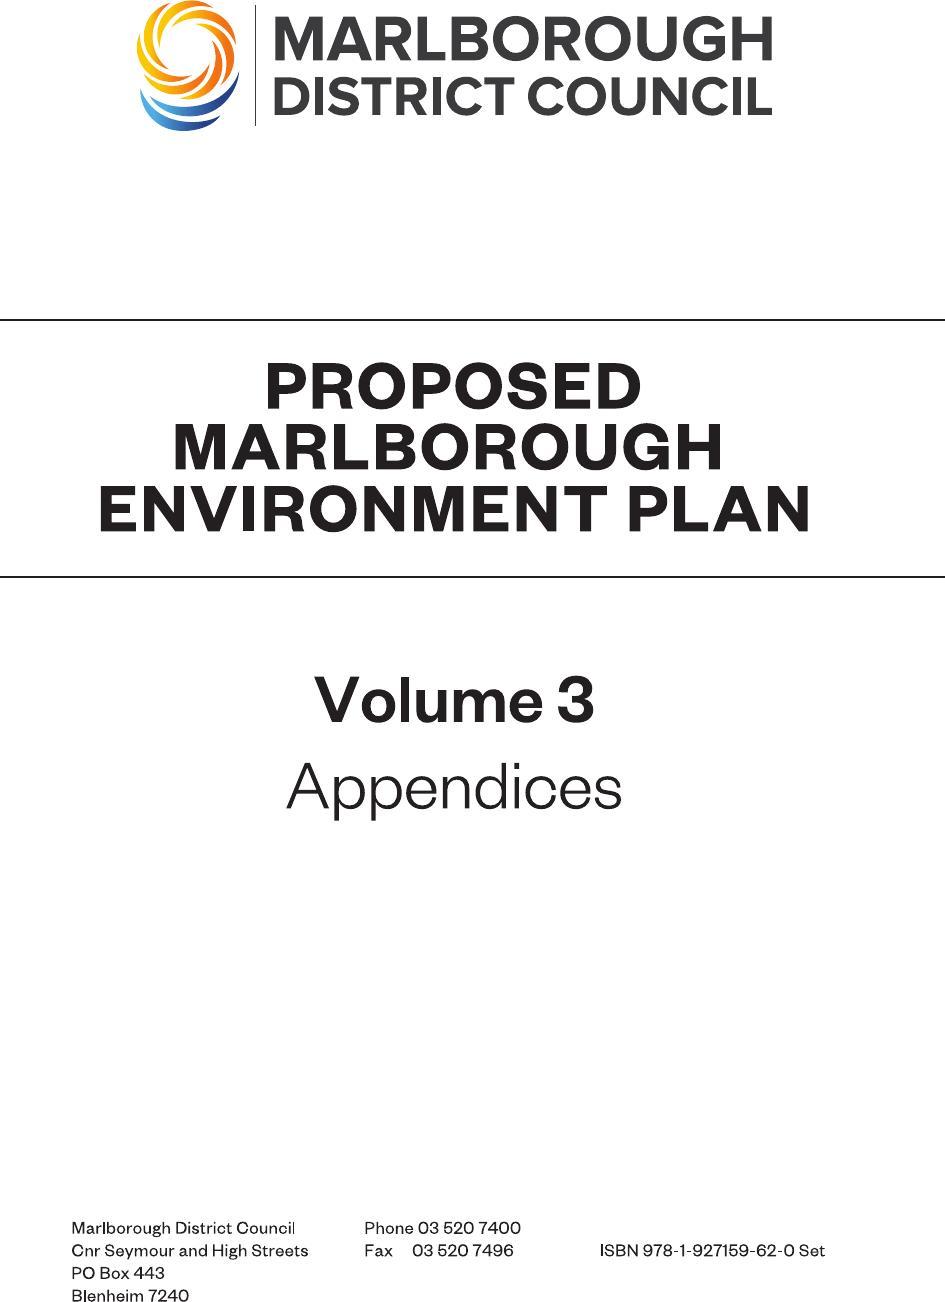 Proposed Marlborough Environment Plan Volume 3 - Appendices